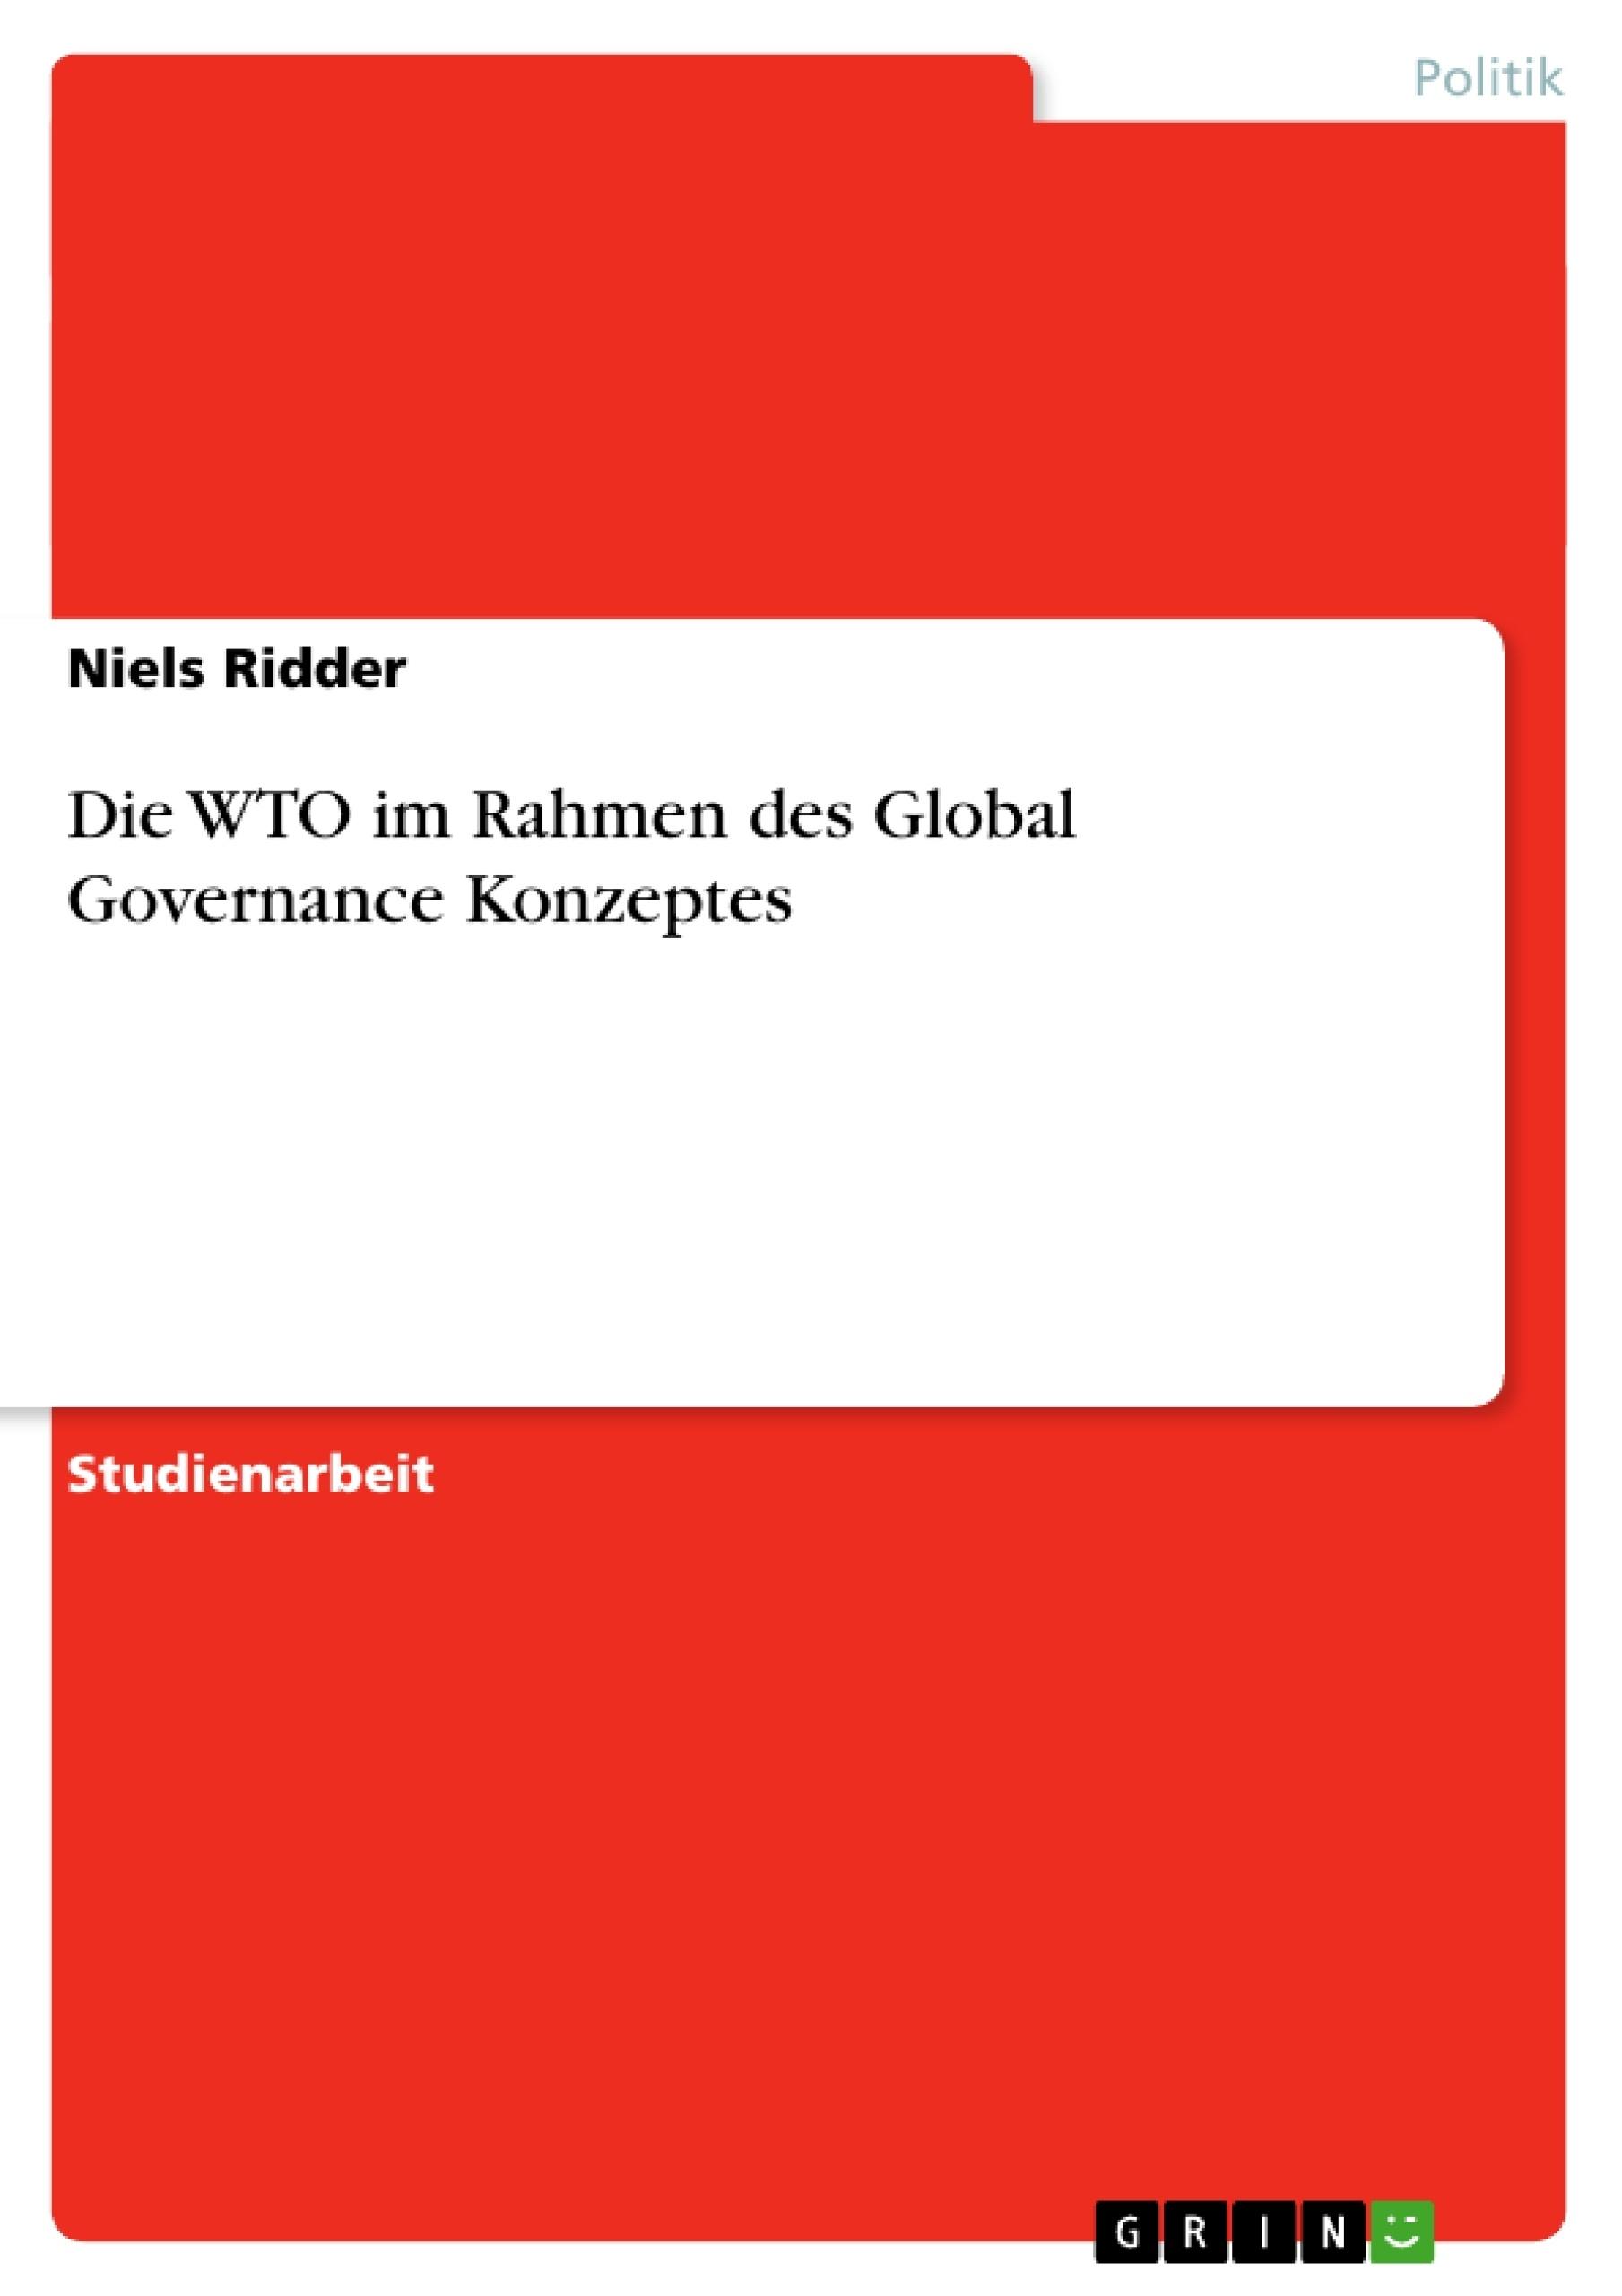 Titel: Die WTO im Rahmen des Global Governance Konzeptes